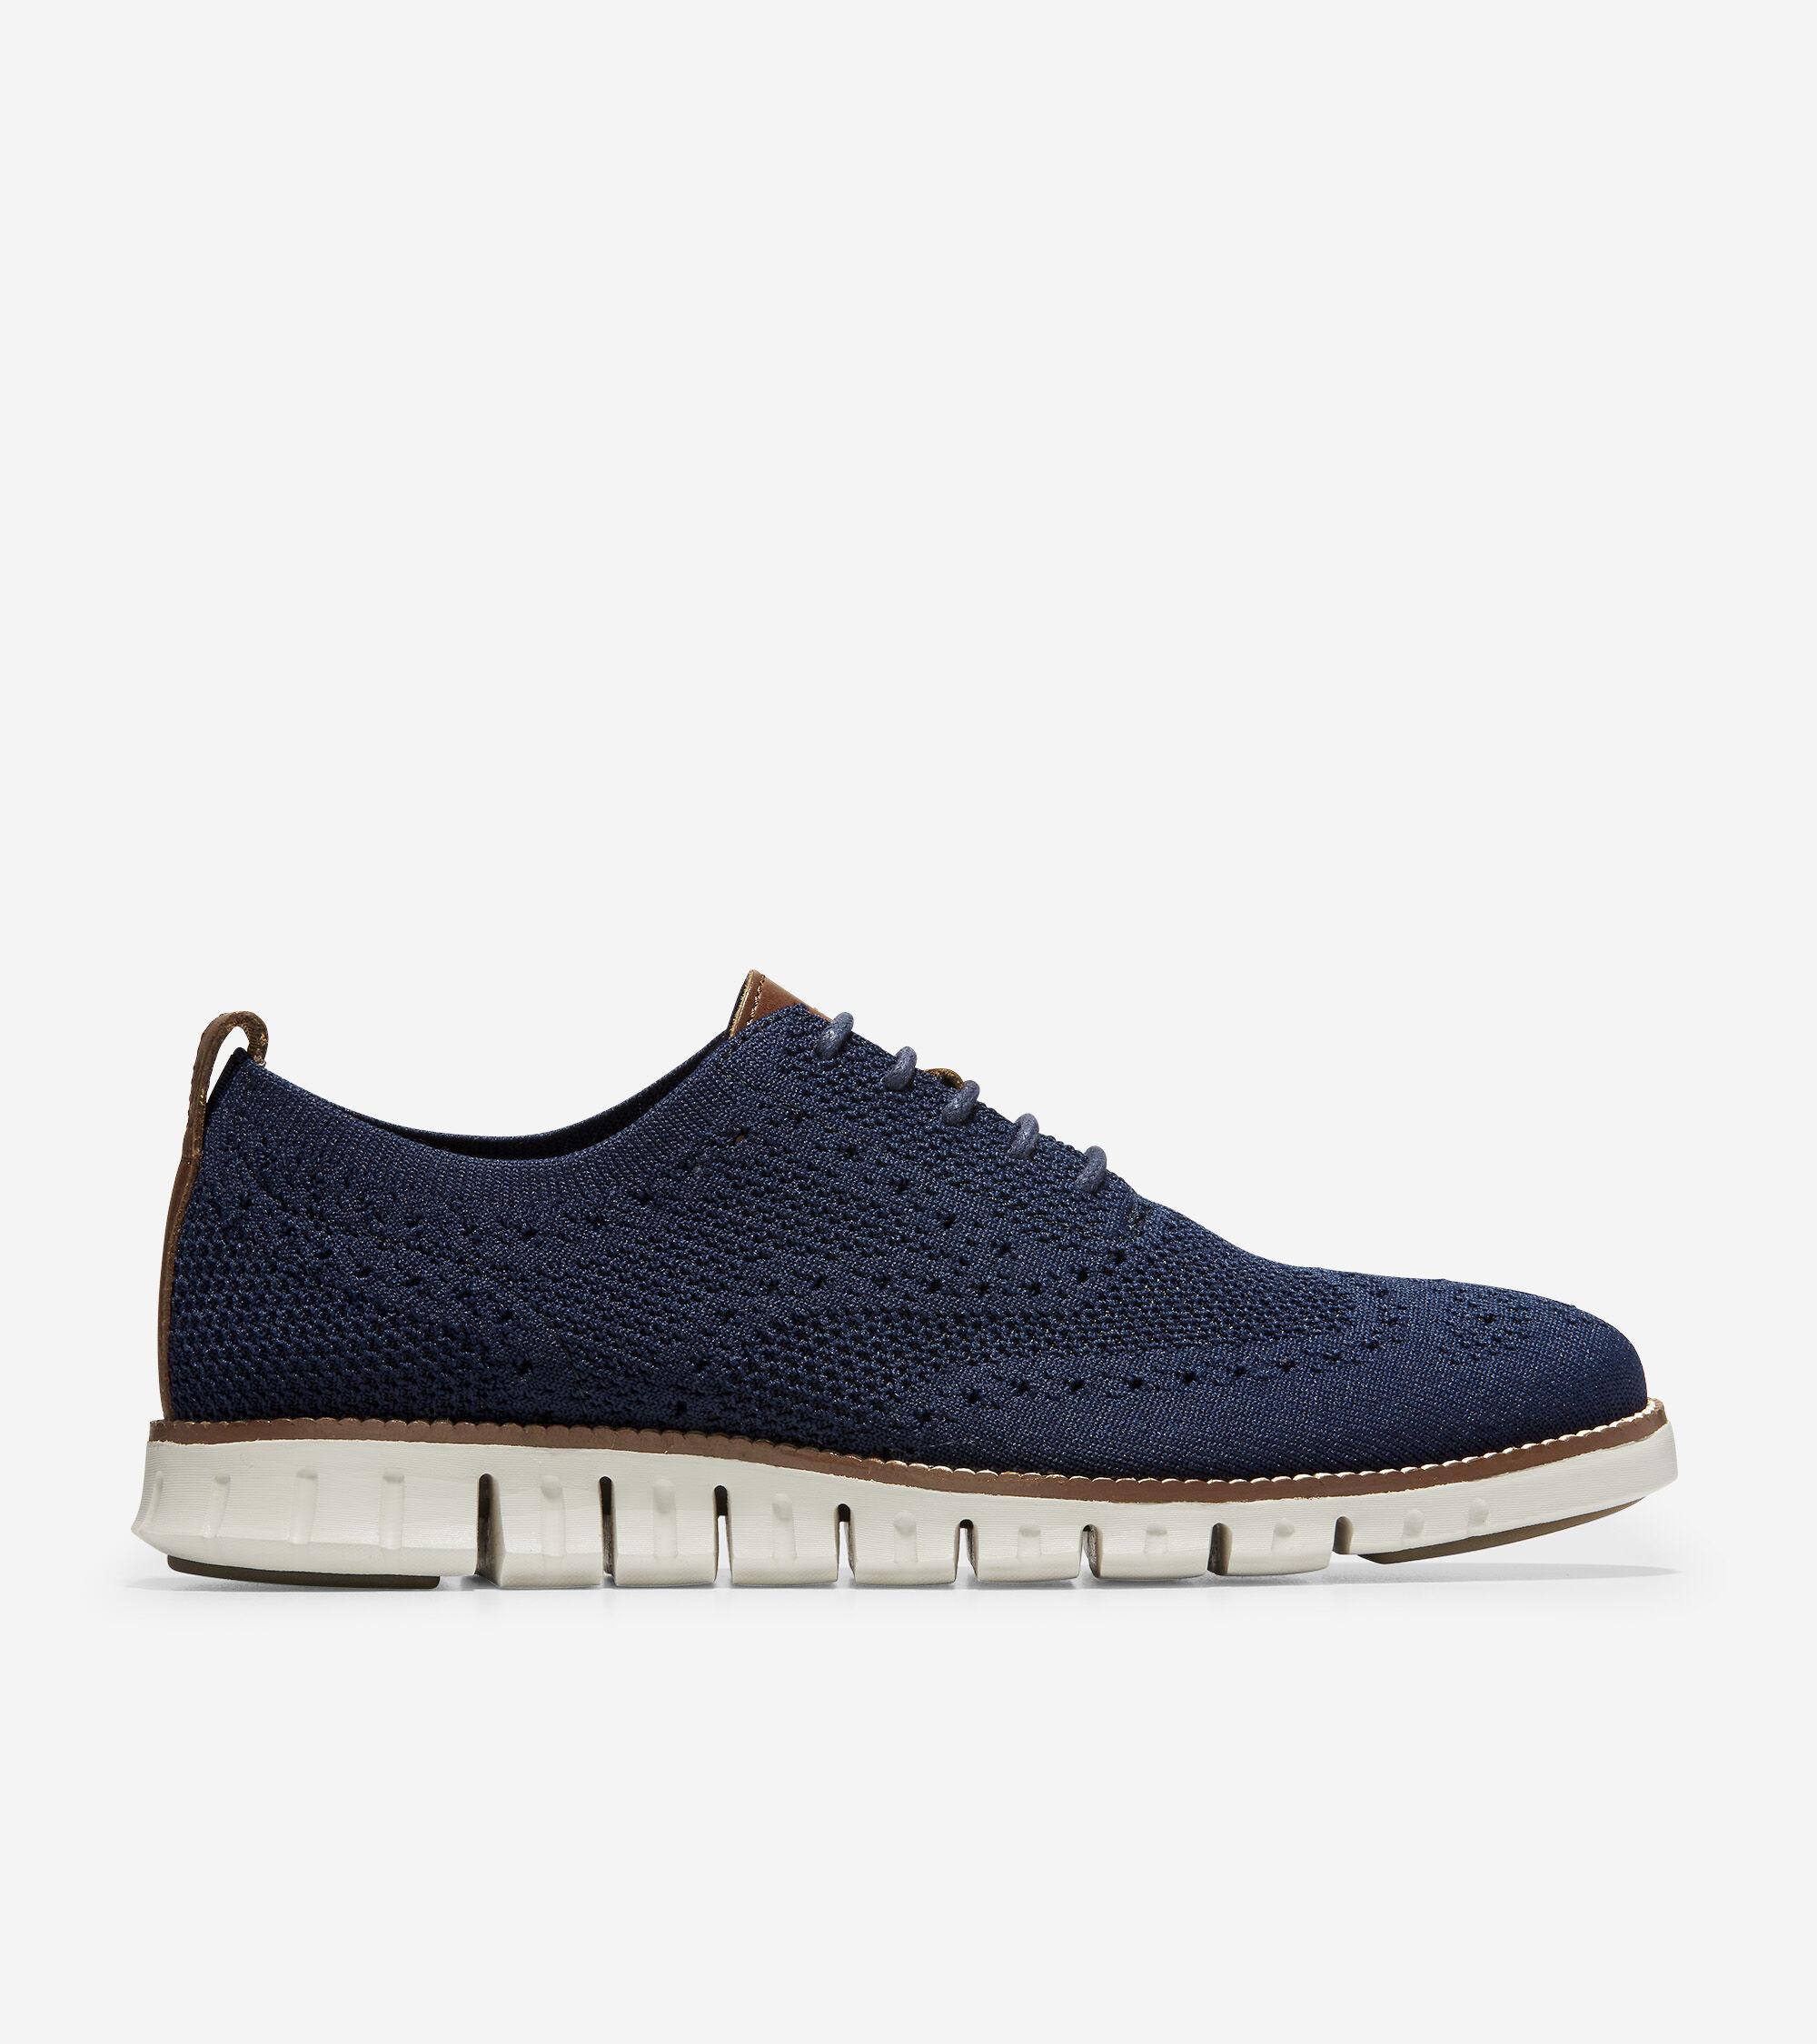 Cole Haan ZEROGRAND Stitchlite Wingtip Oxford Shoes